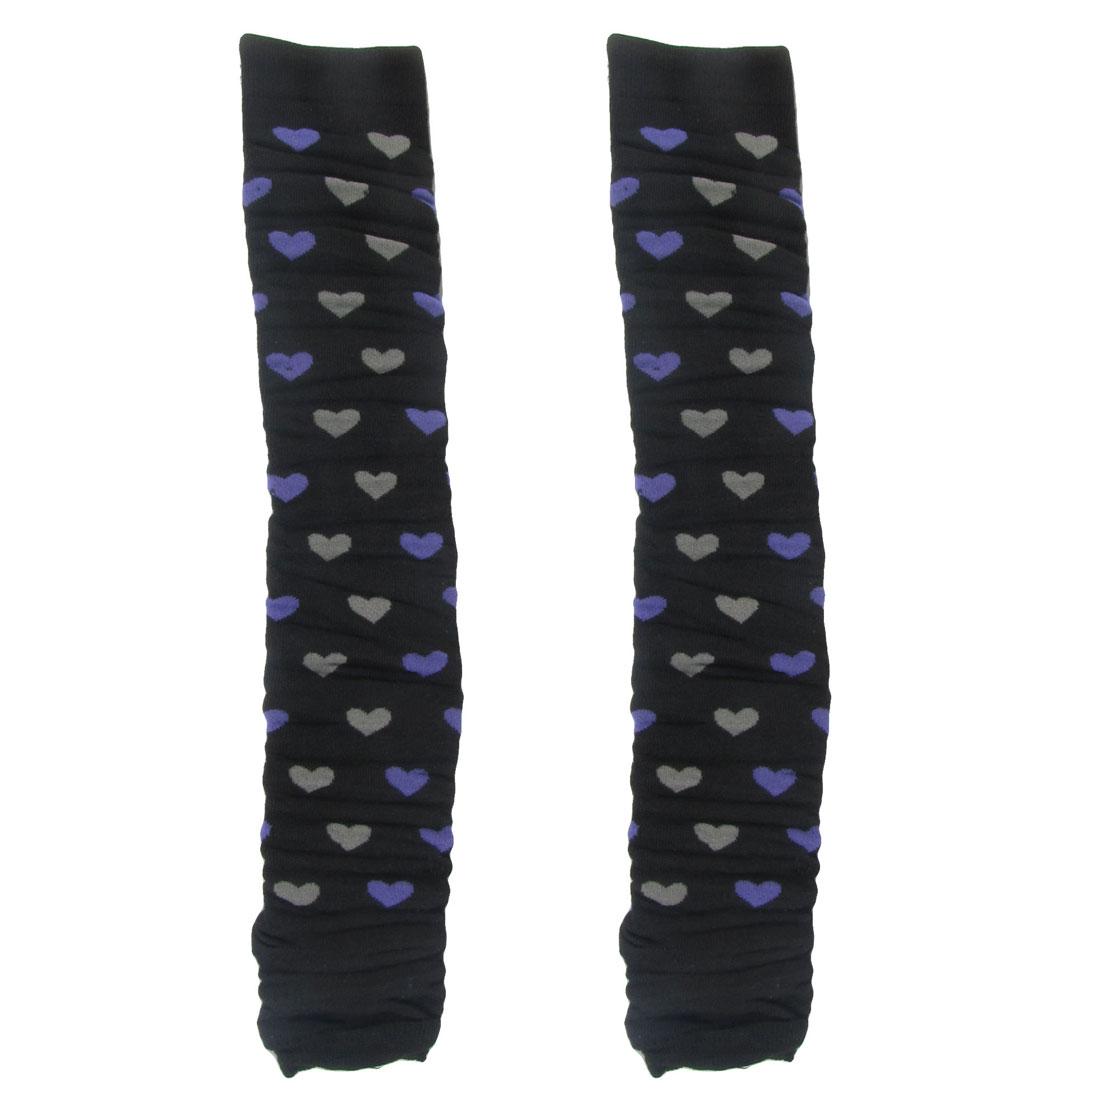 Pair Gray Purple Heart Print Black Knitted Leg Warmers Socks for Ladies